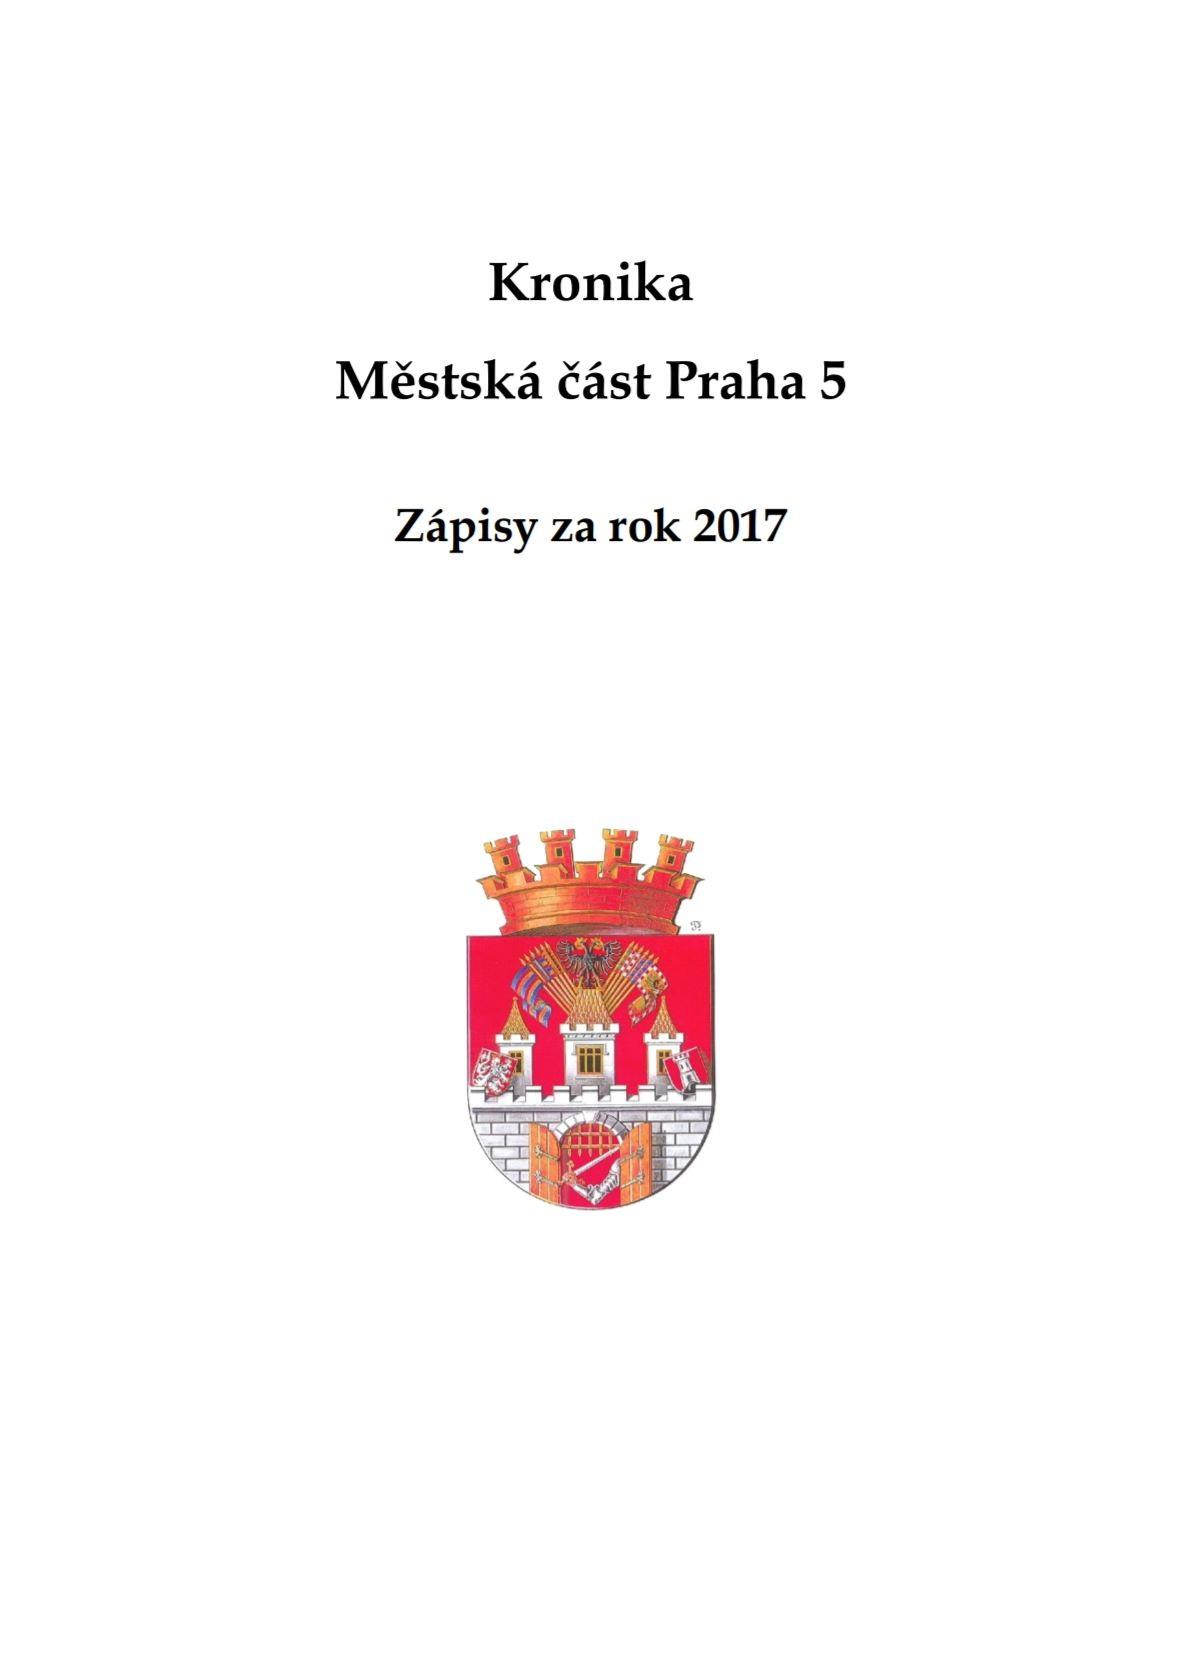 Kronika MČ Praha 5 (2017)